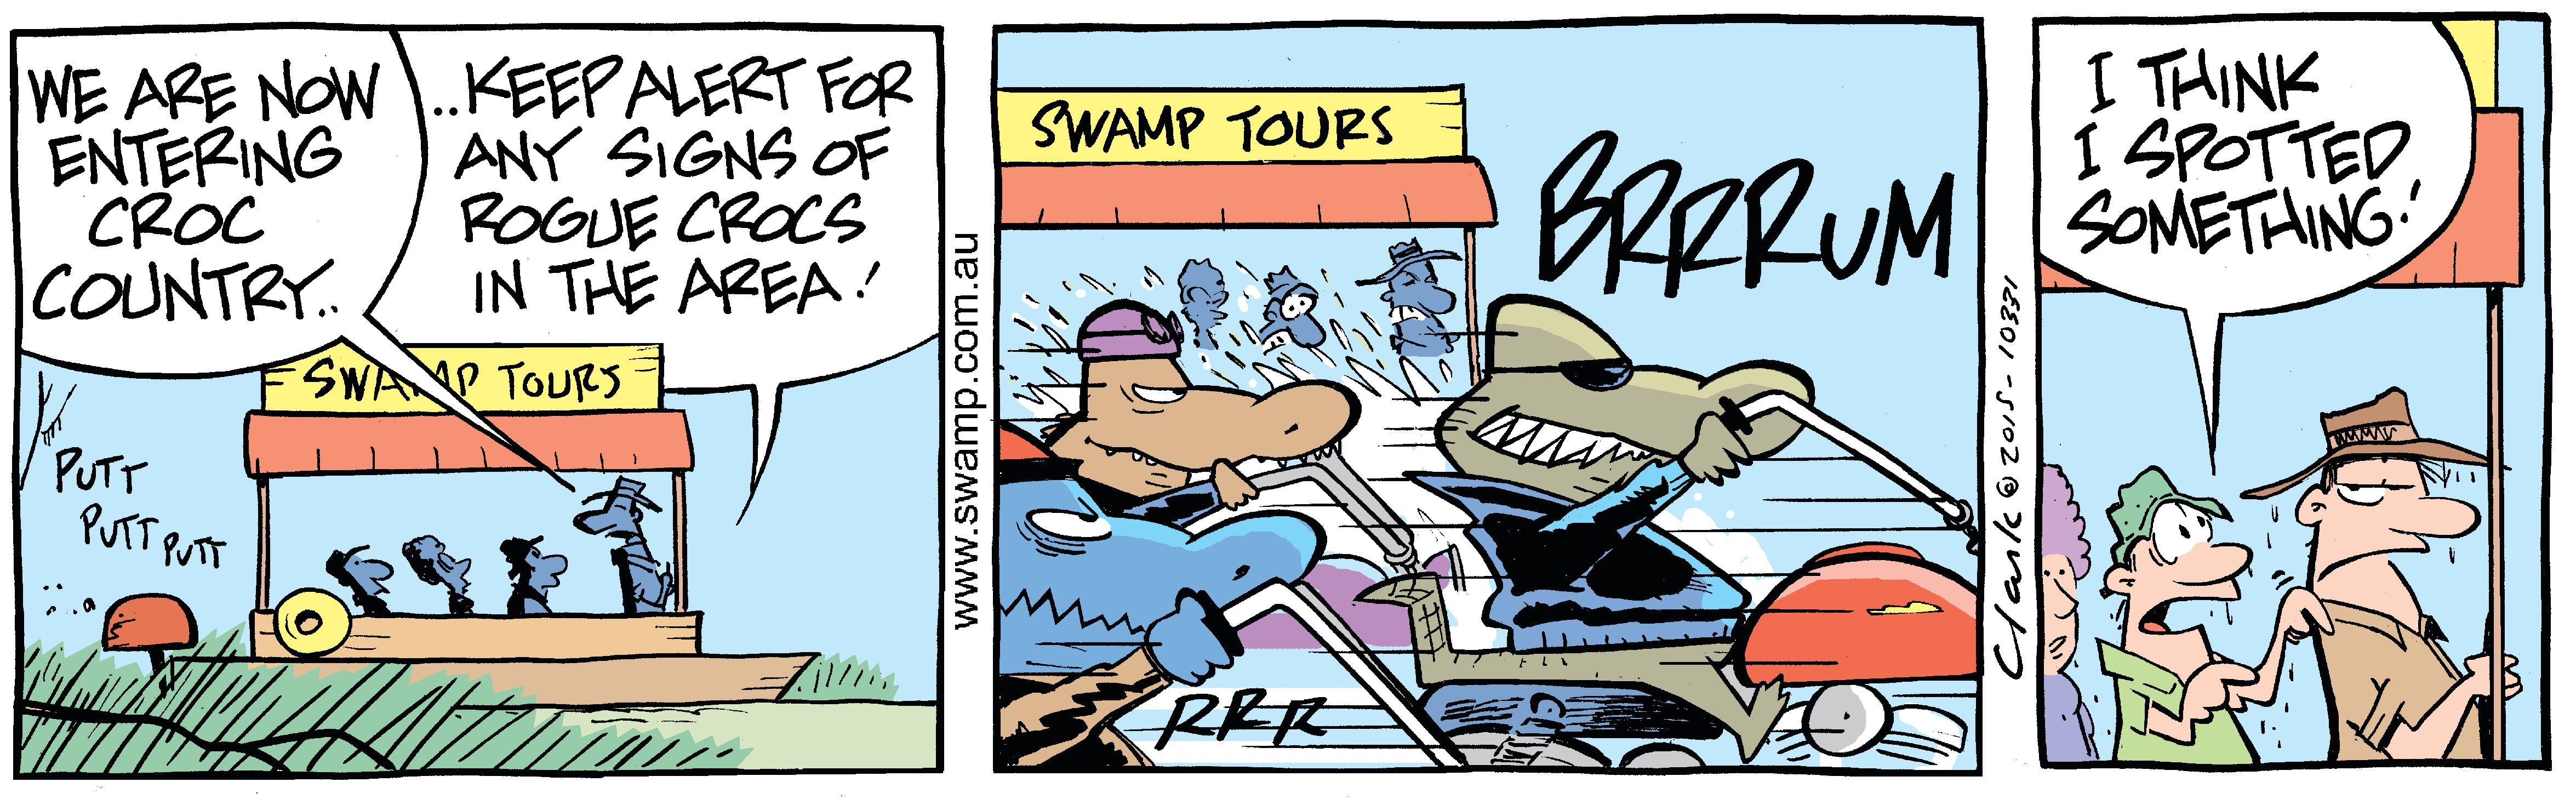 Rogue Crocodiles Motorbikes Comic